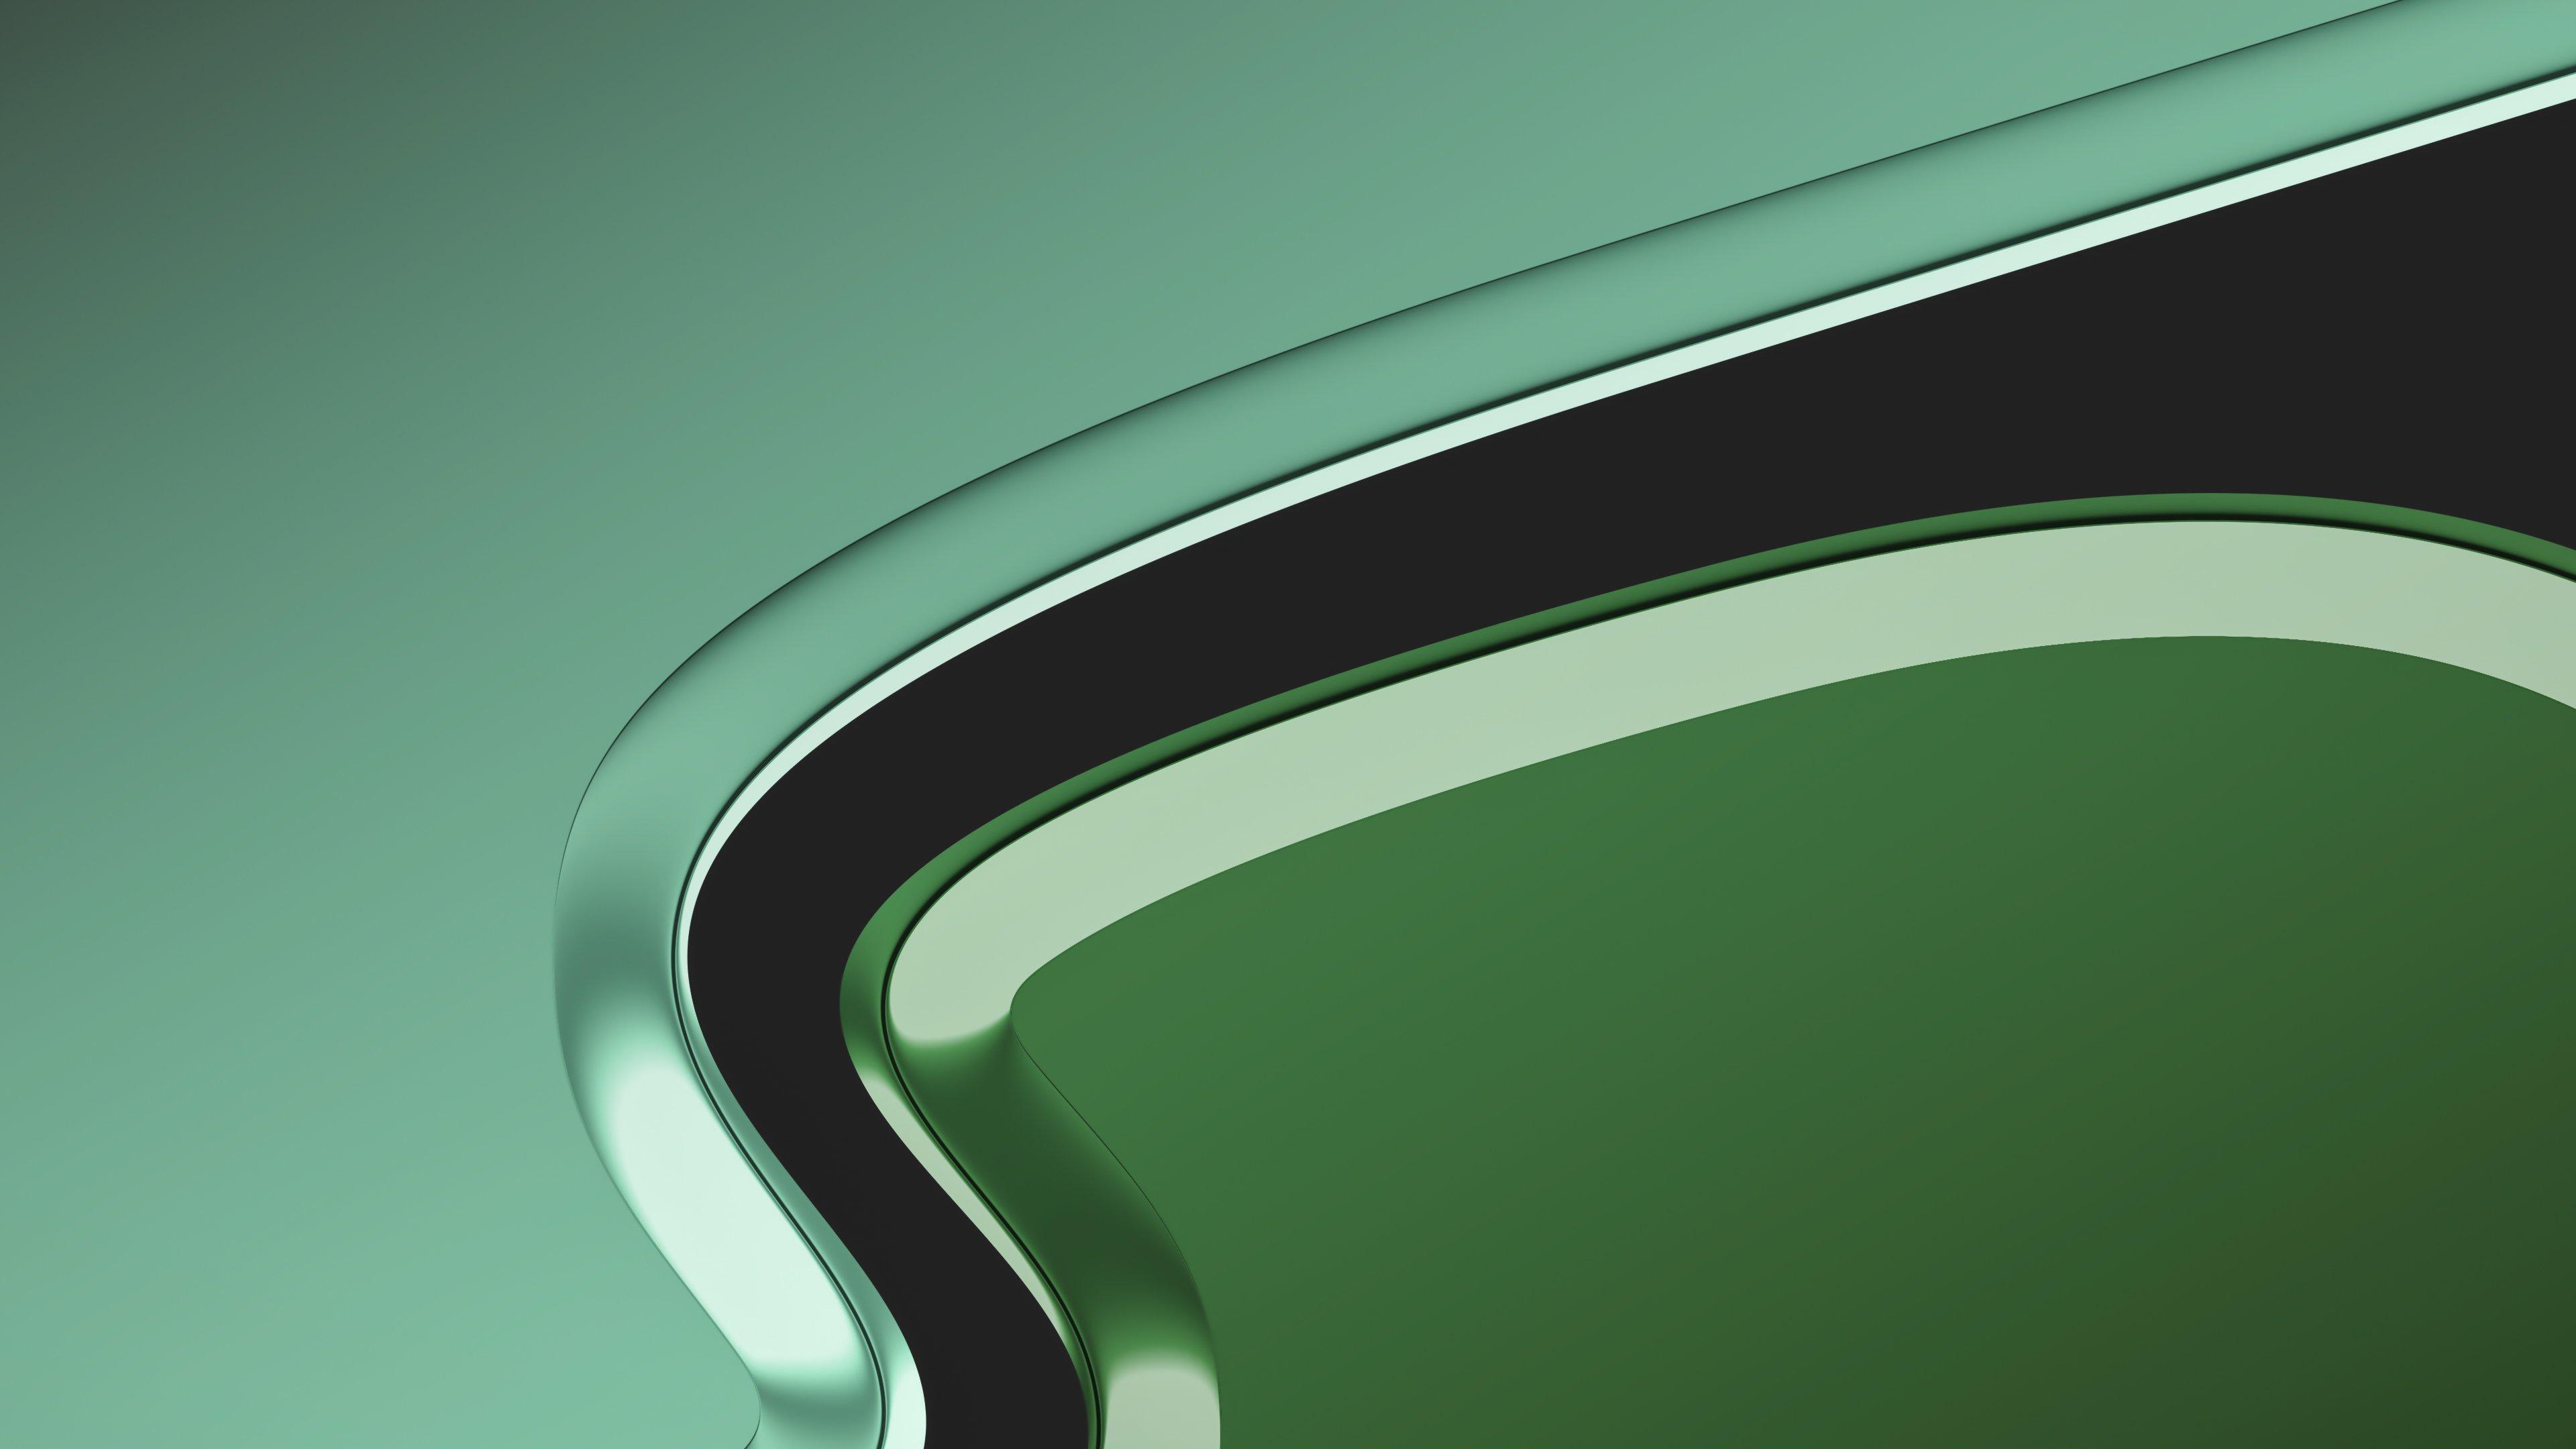 Wallpaper Green color flow